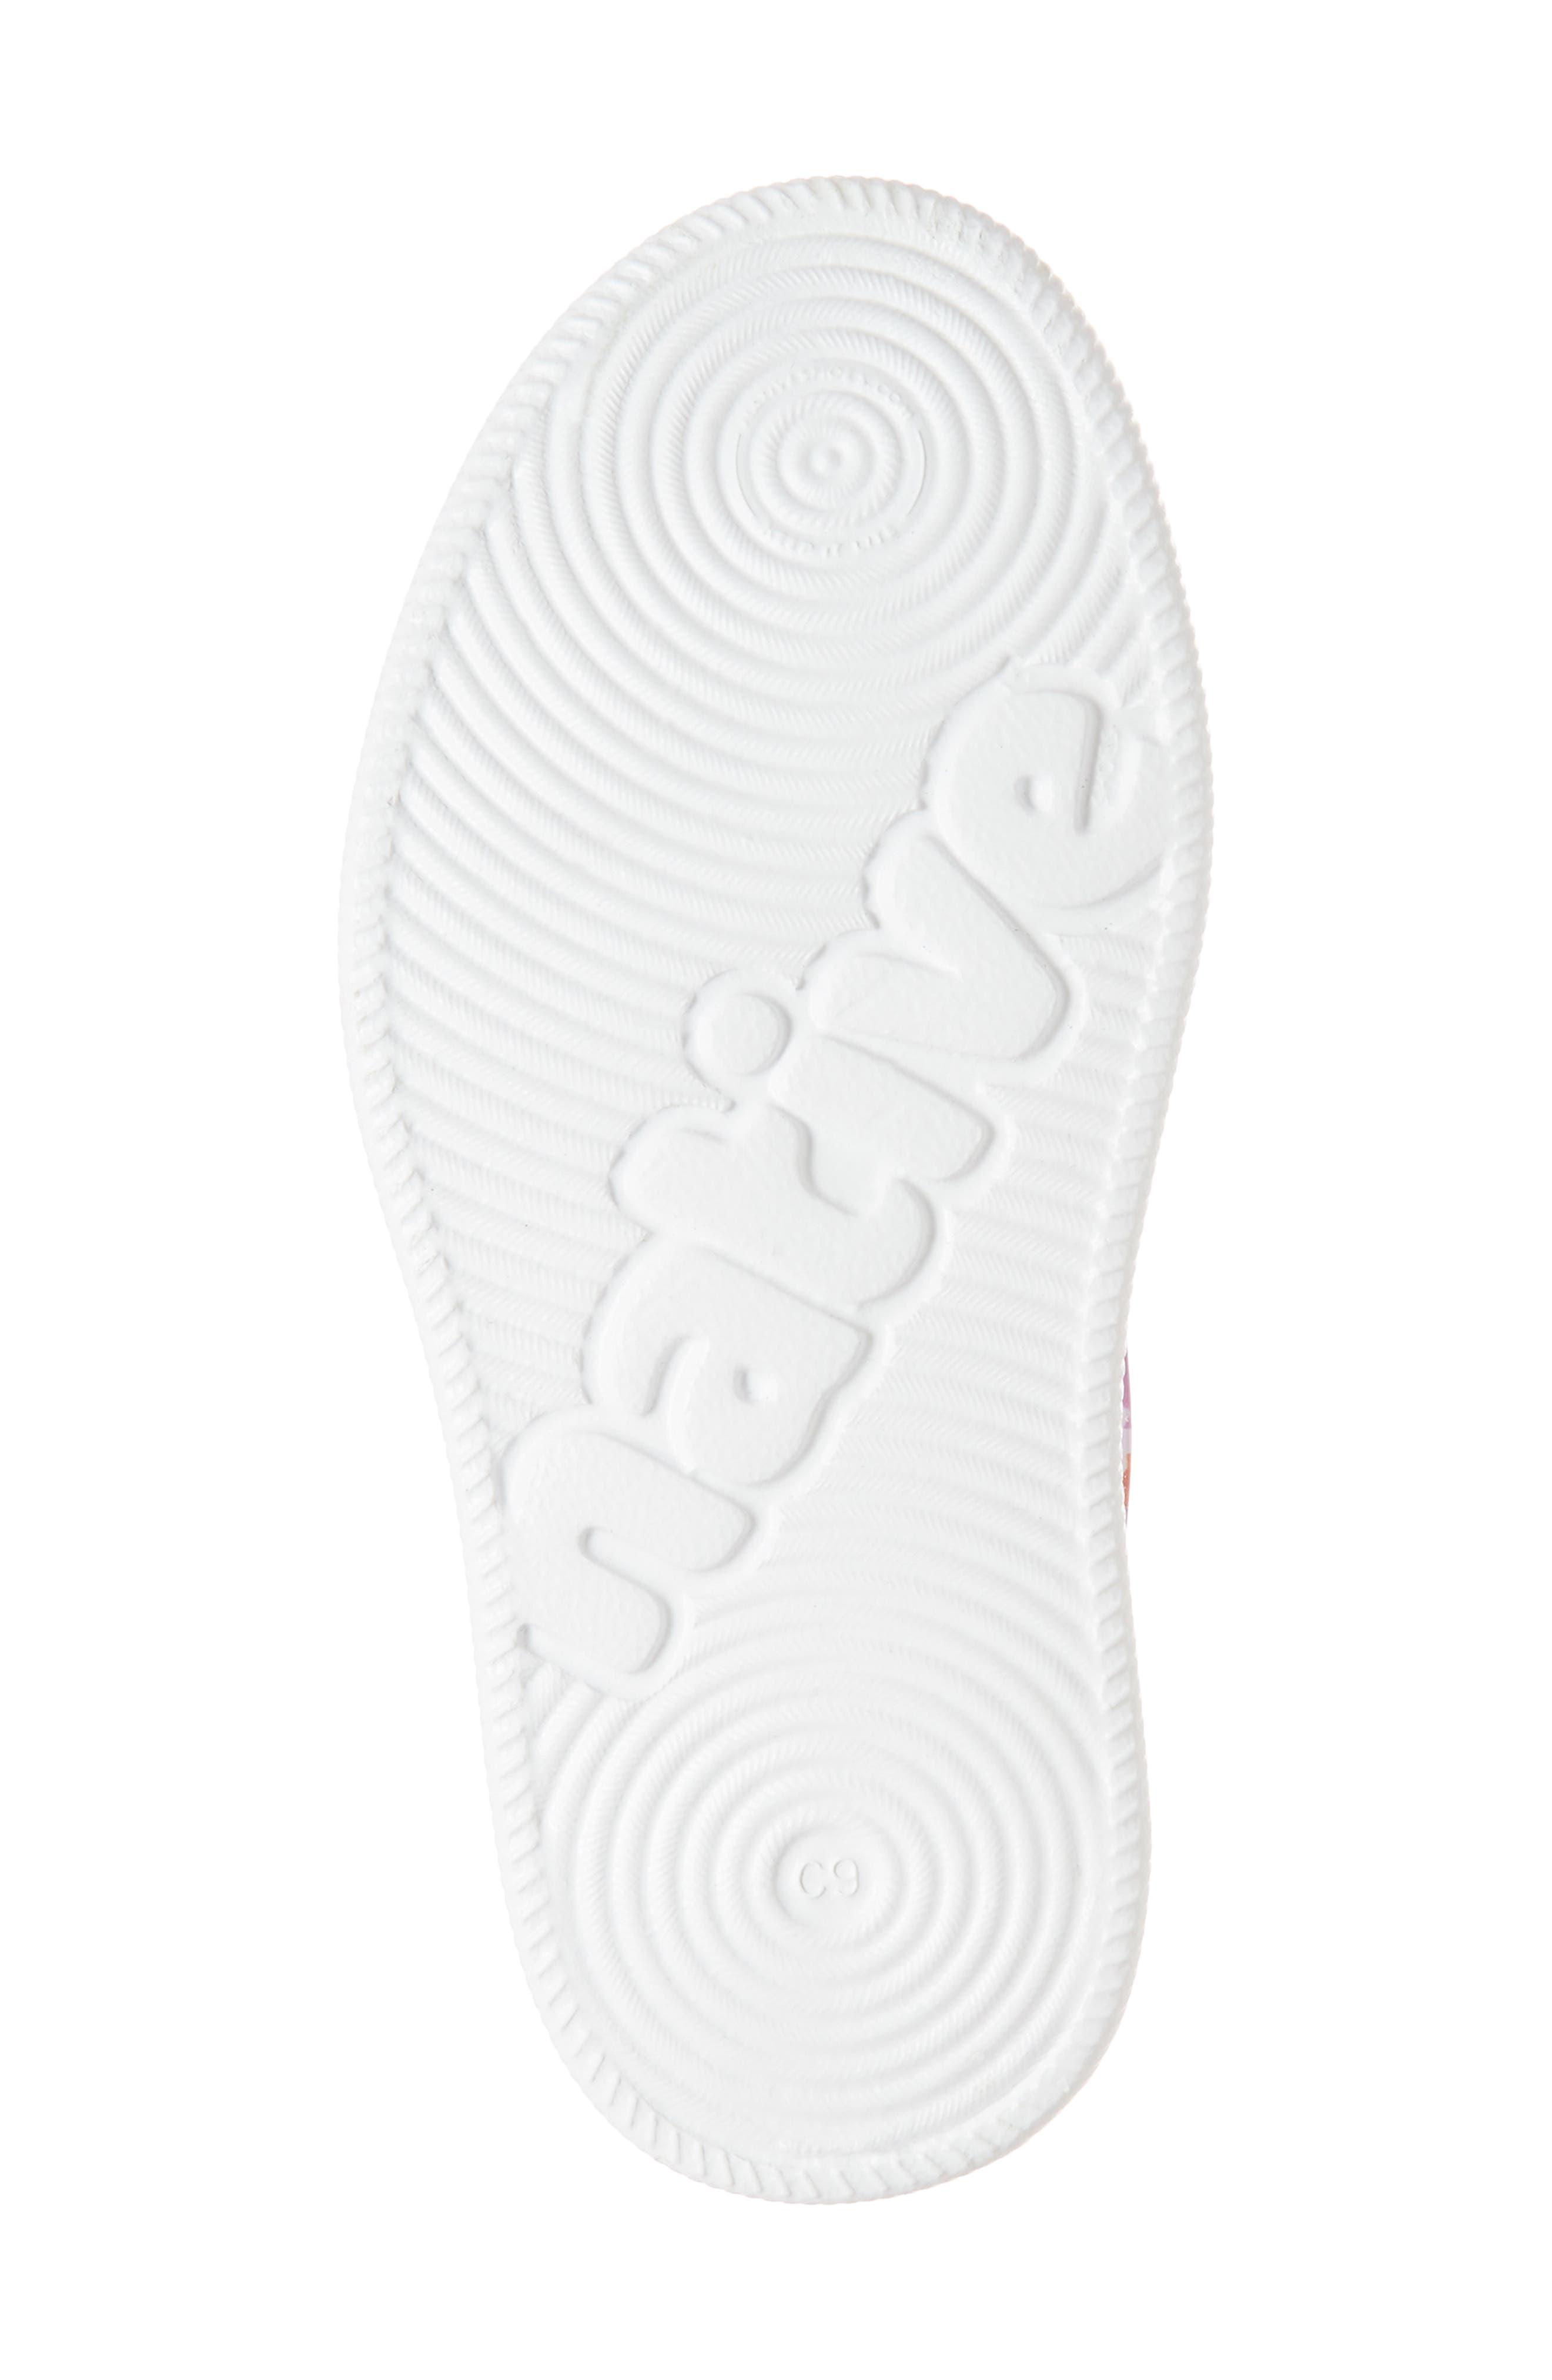 Verona Perforated Slip-On,                             Alternate thumbnail 6, color,                             Peace Purple/ White/ Daisy